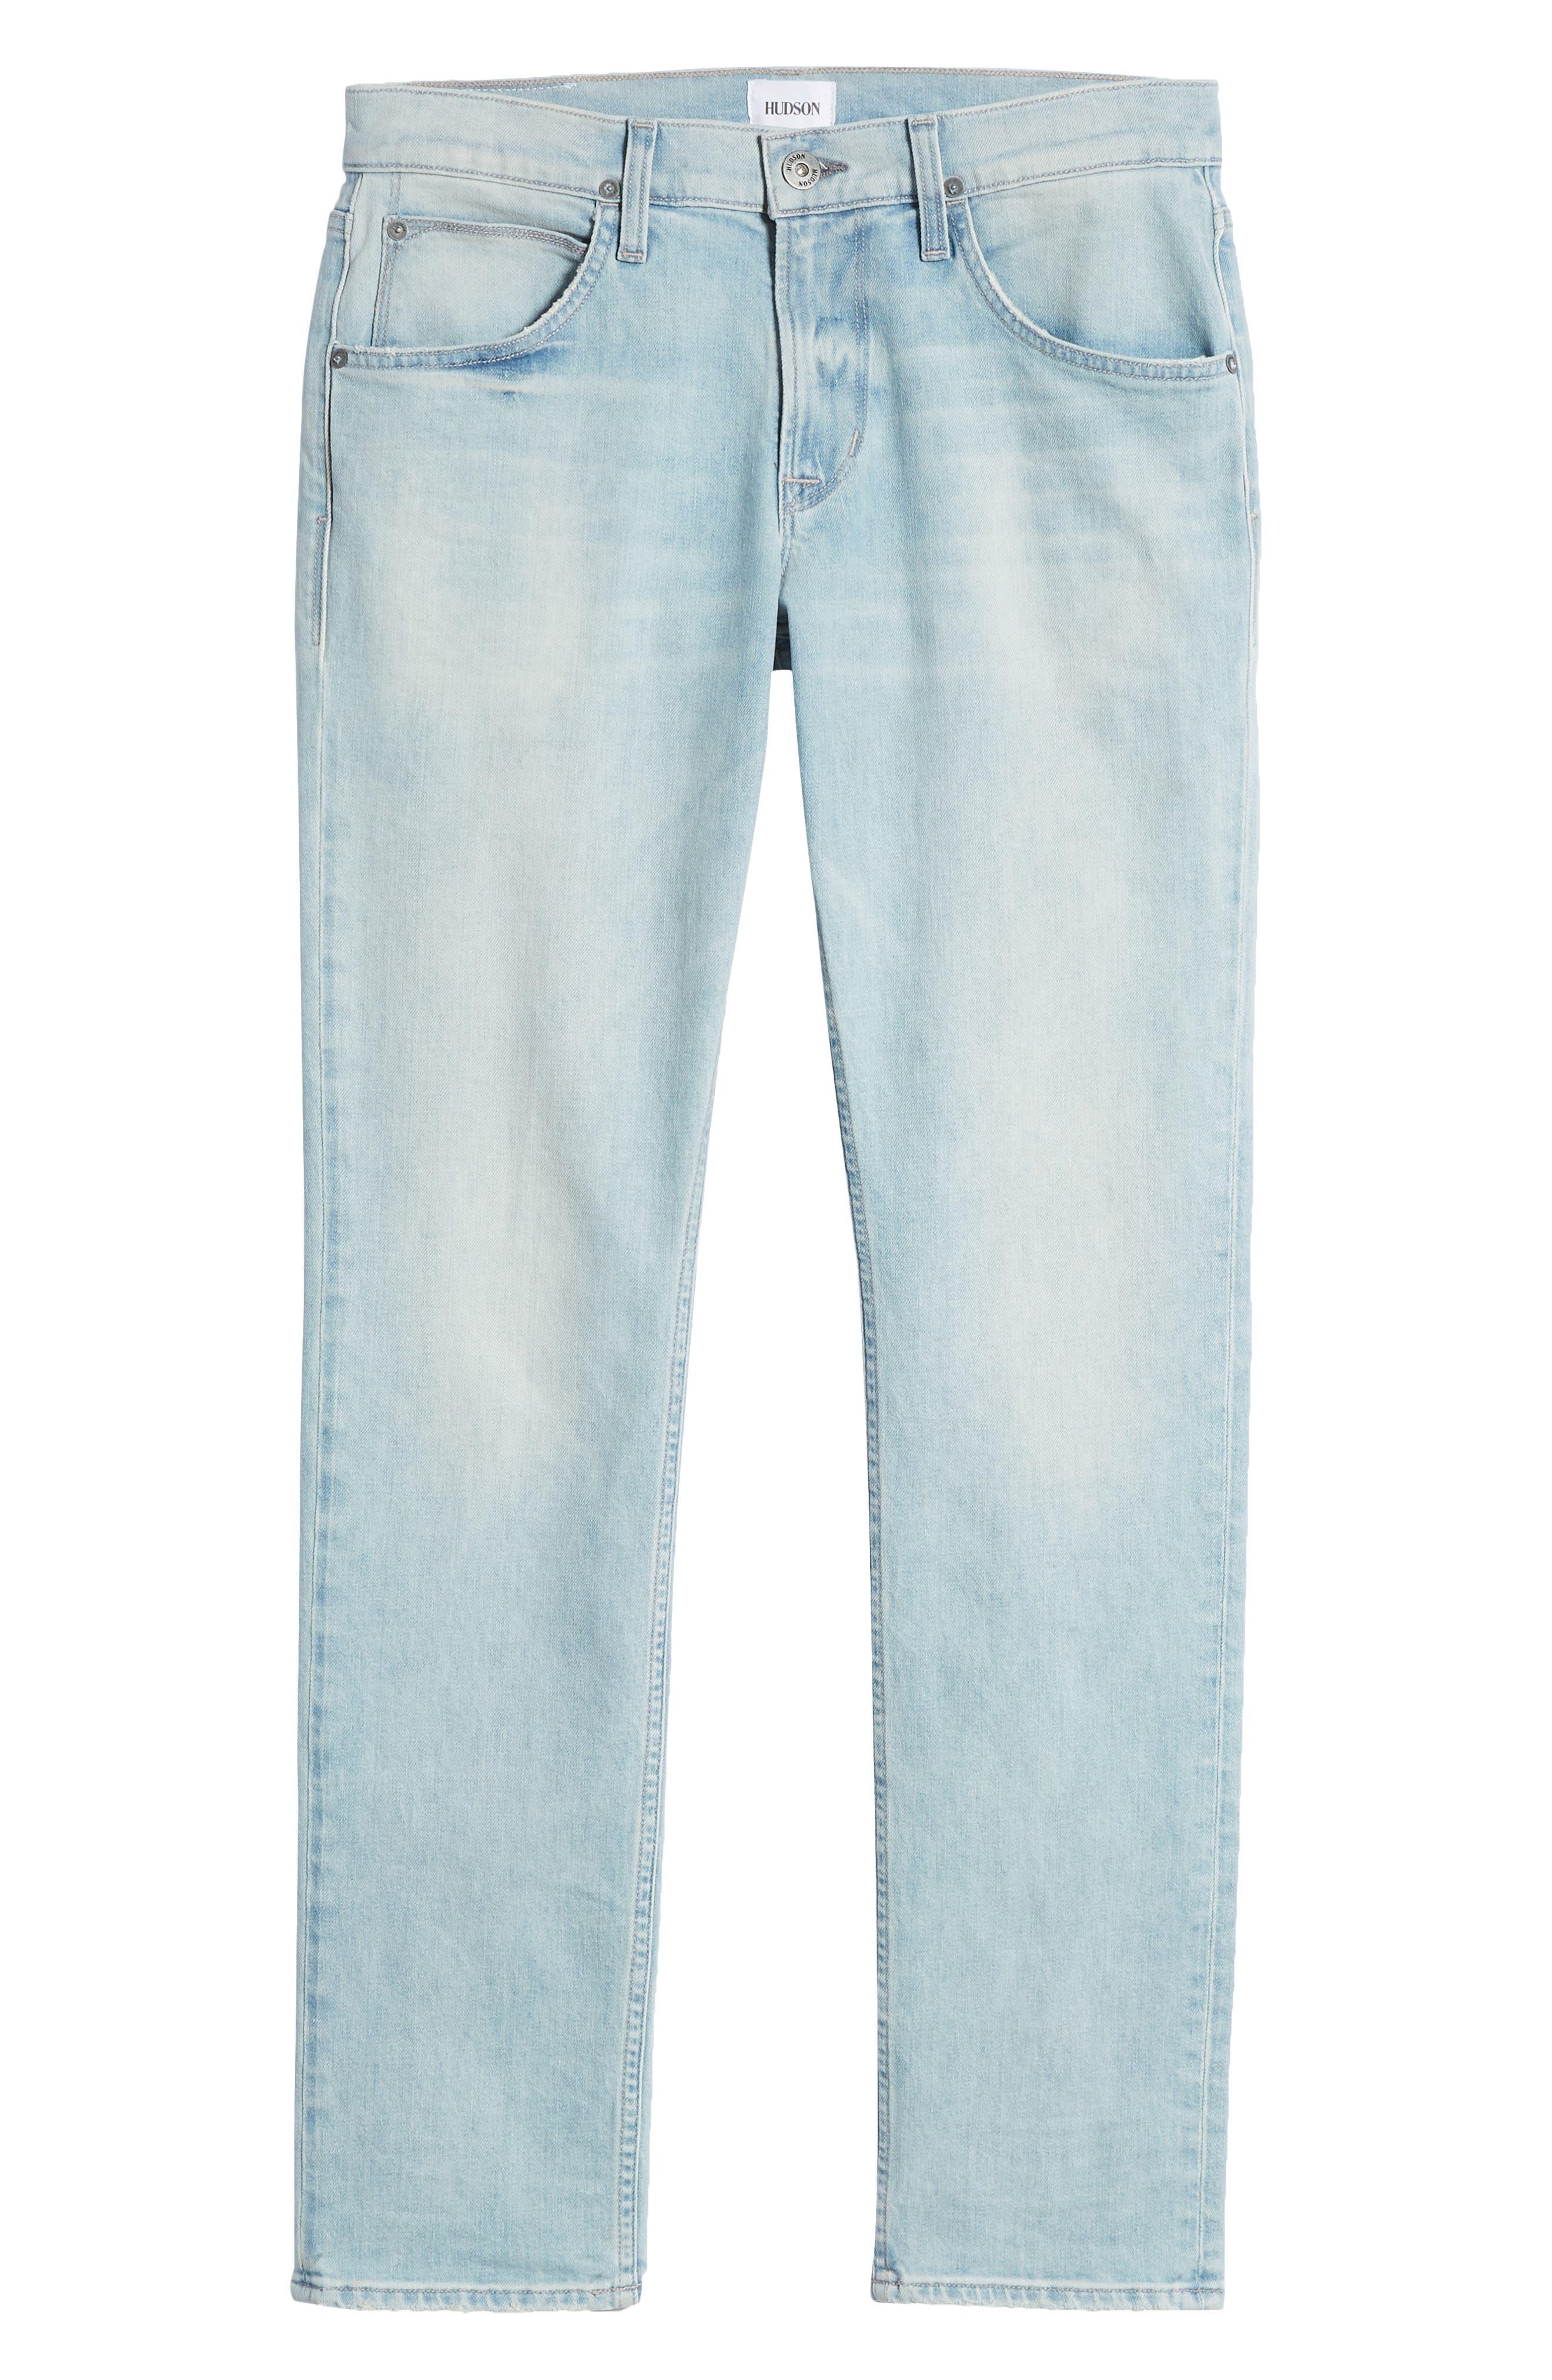 Blake Slim Fit Jeans,                             Alternate thumbnail 6, color,                             Rewired